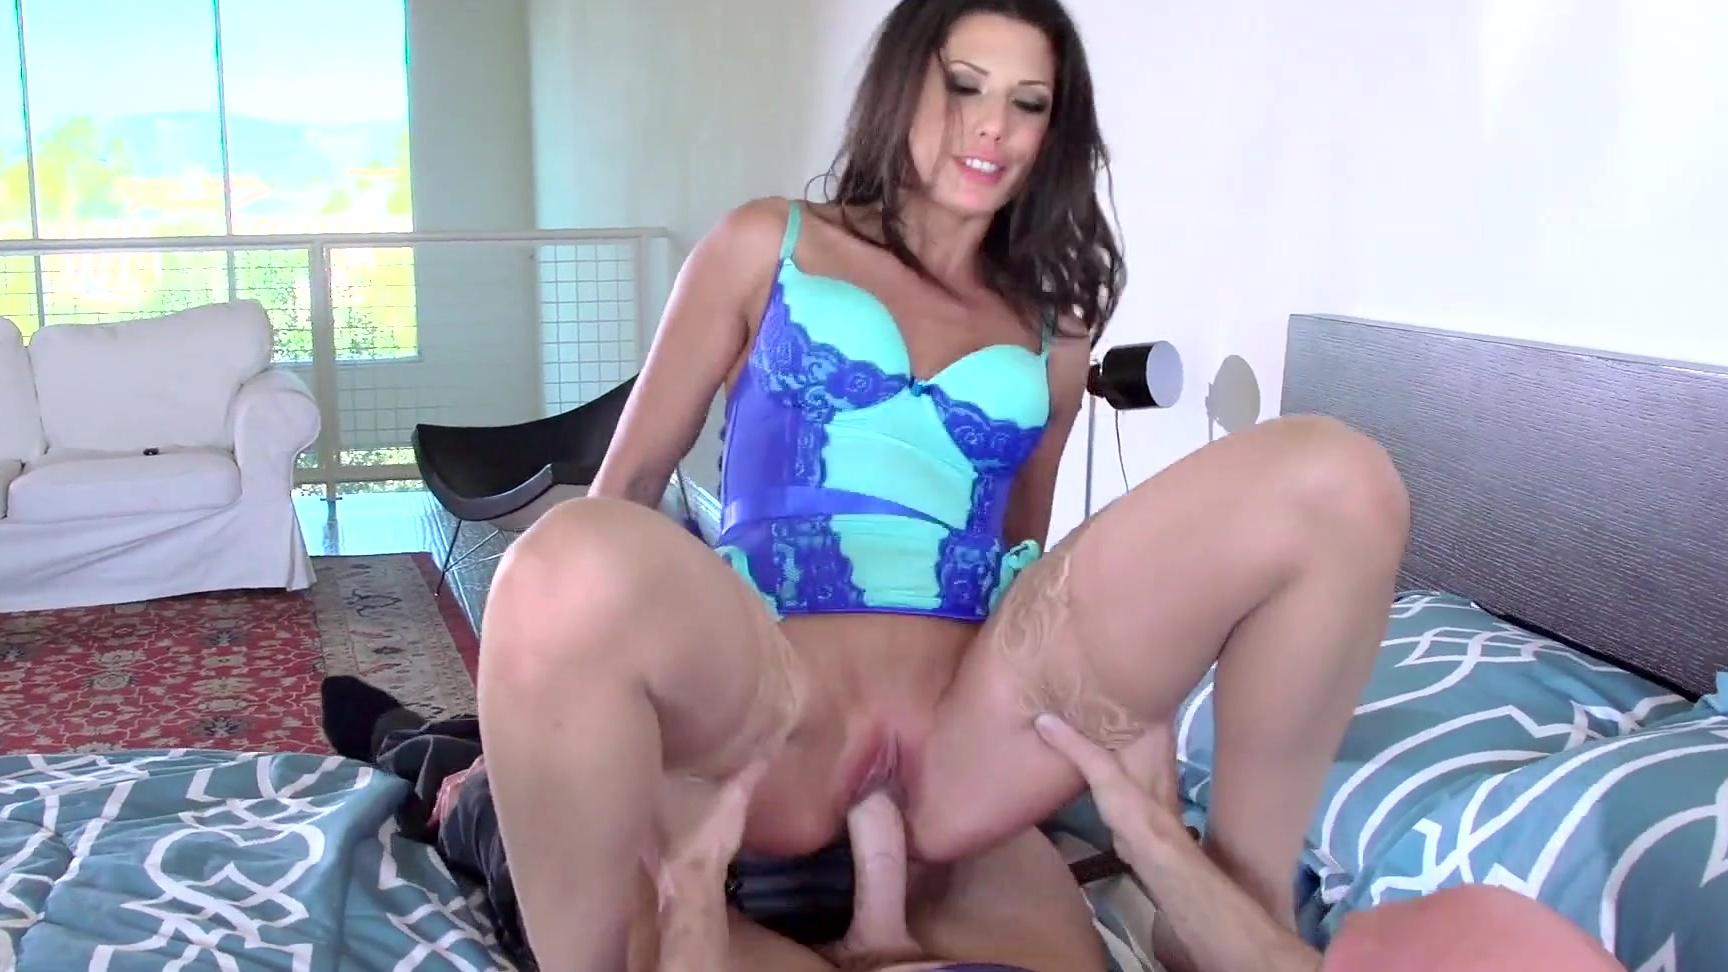 latina milf alexa tomas gets a married throbbing cock to suck & fuck